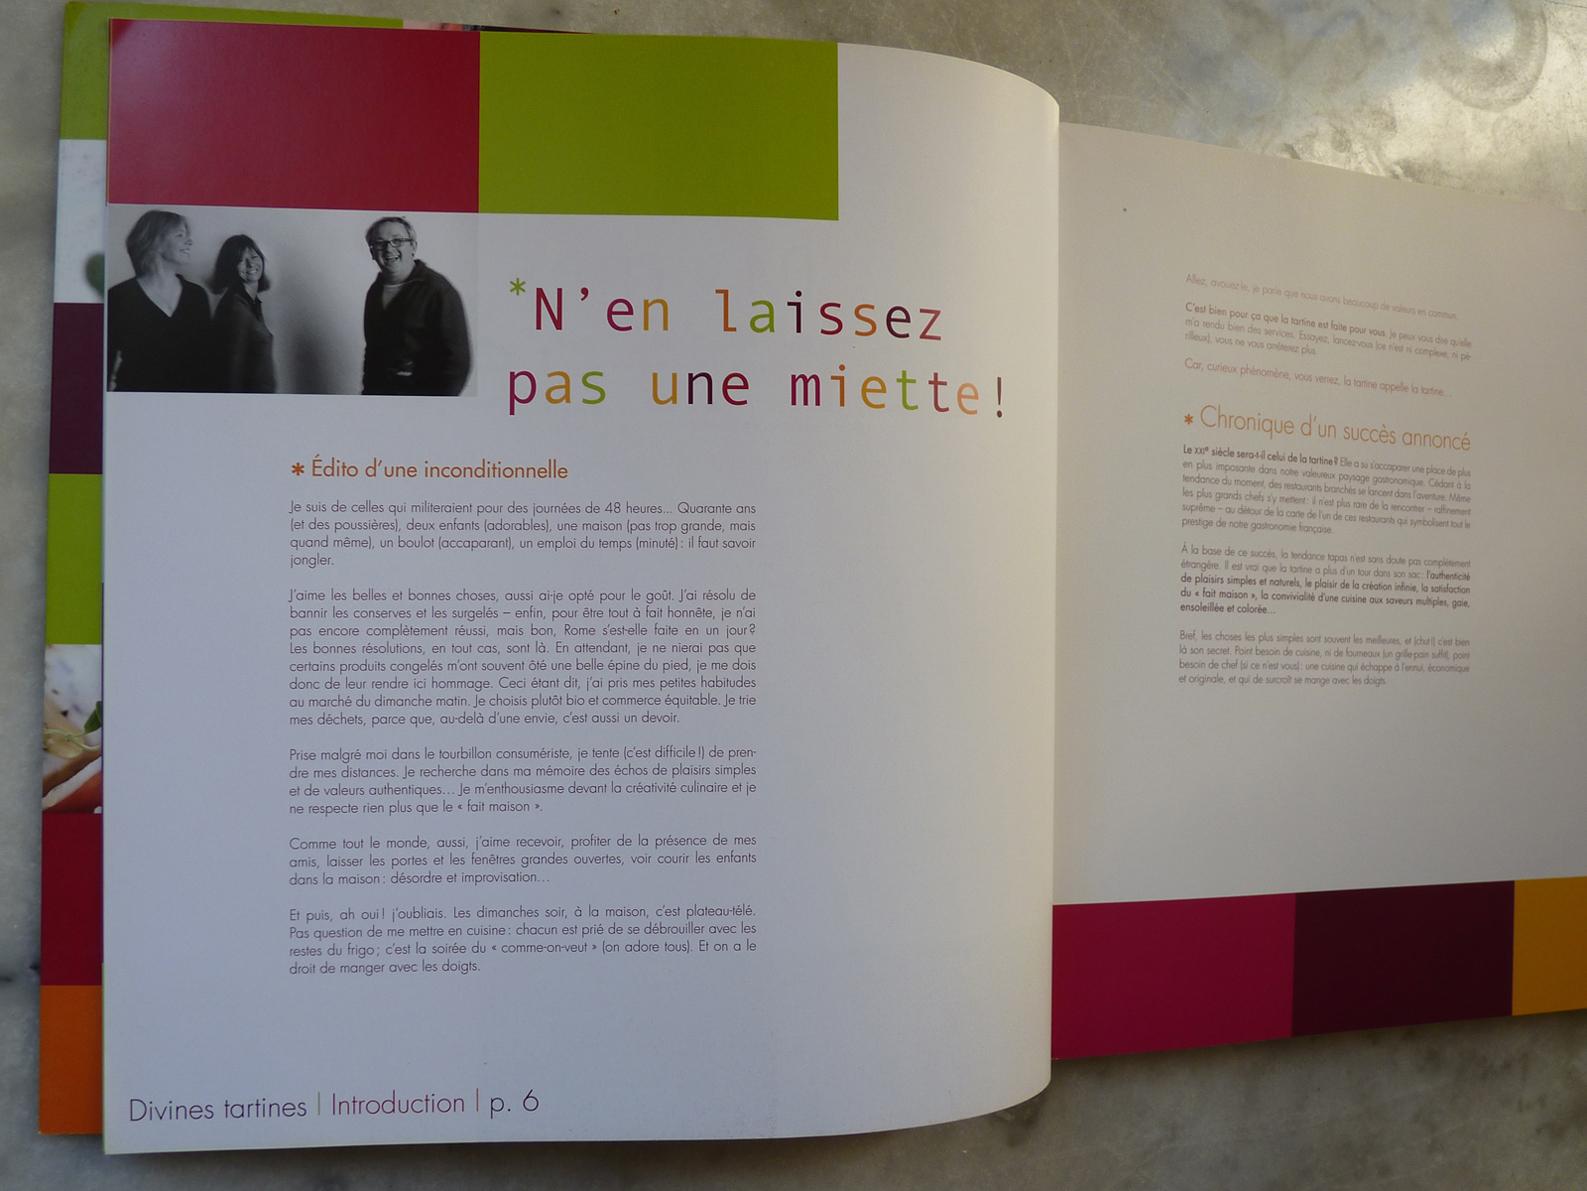 Divines tartines livre de cuisine marie zuurbier - Editions sud ouest cuisine ...